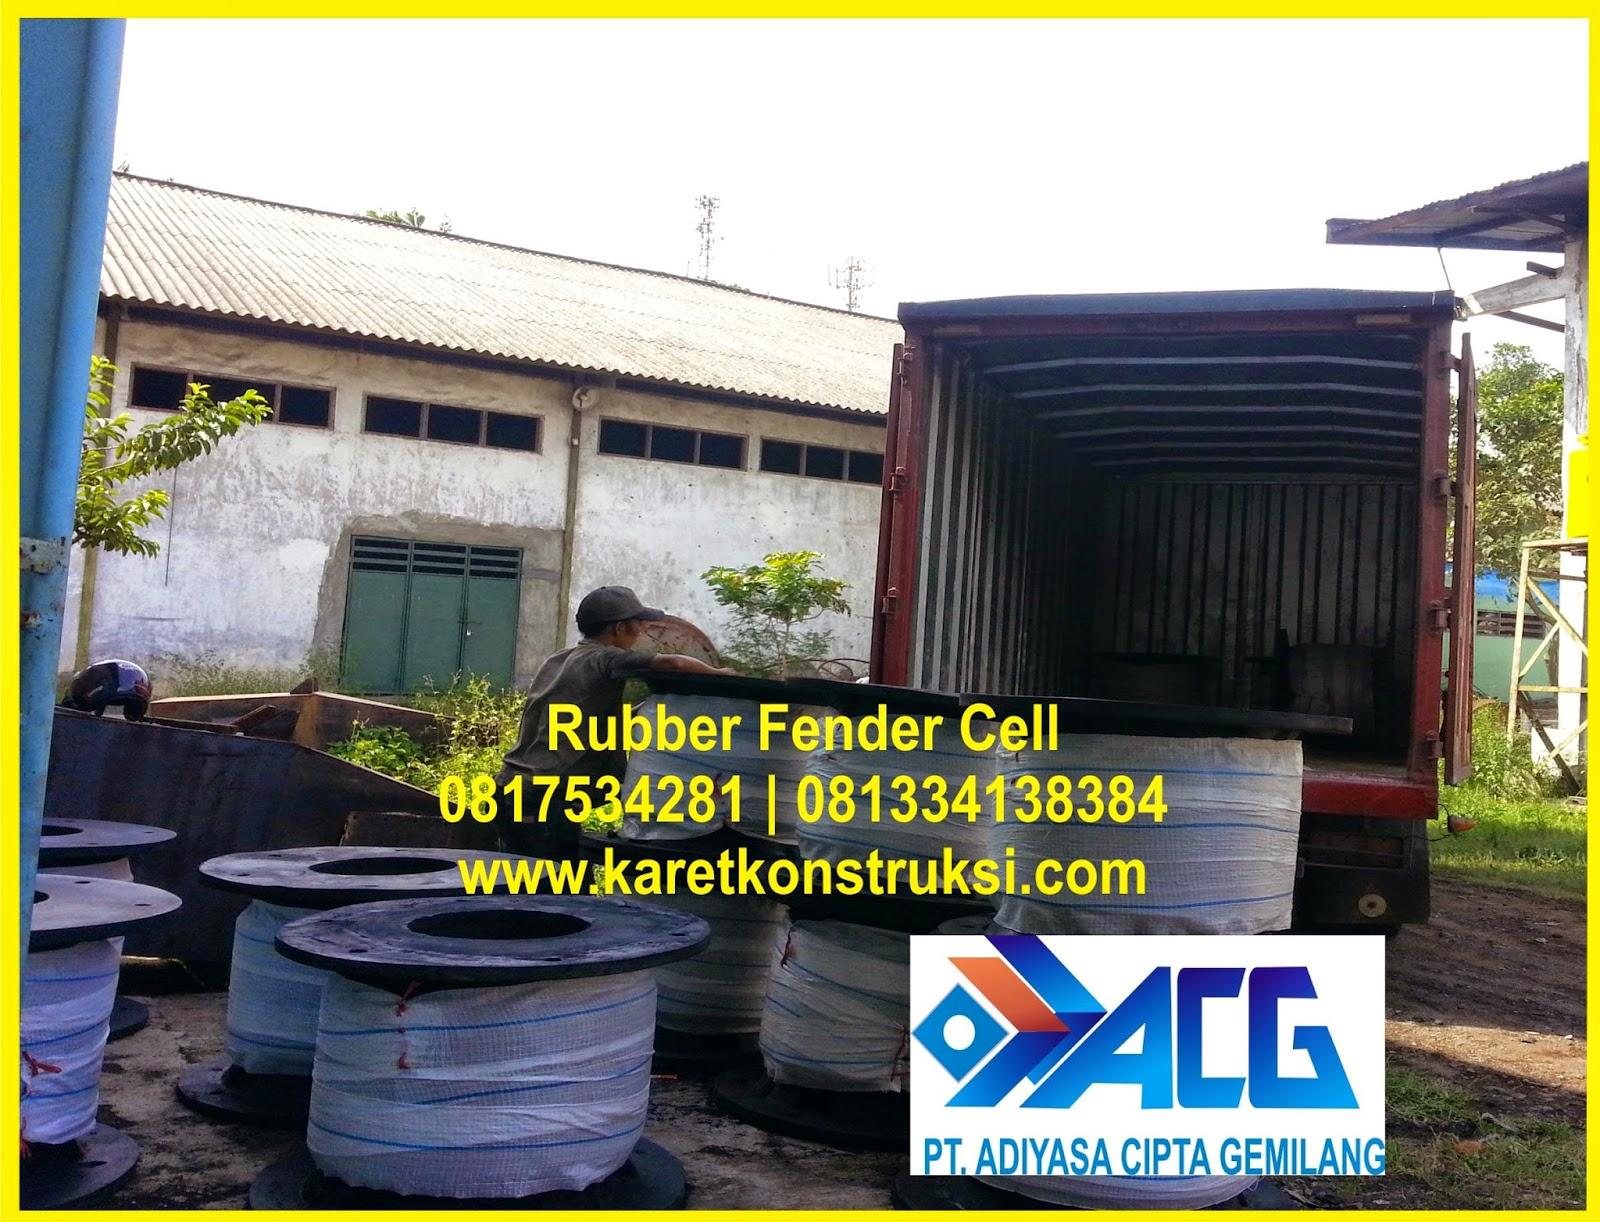 Produksi Rubber Fender Dermag | Harga Rubber Fender | Jual ...